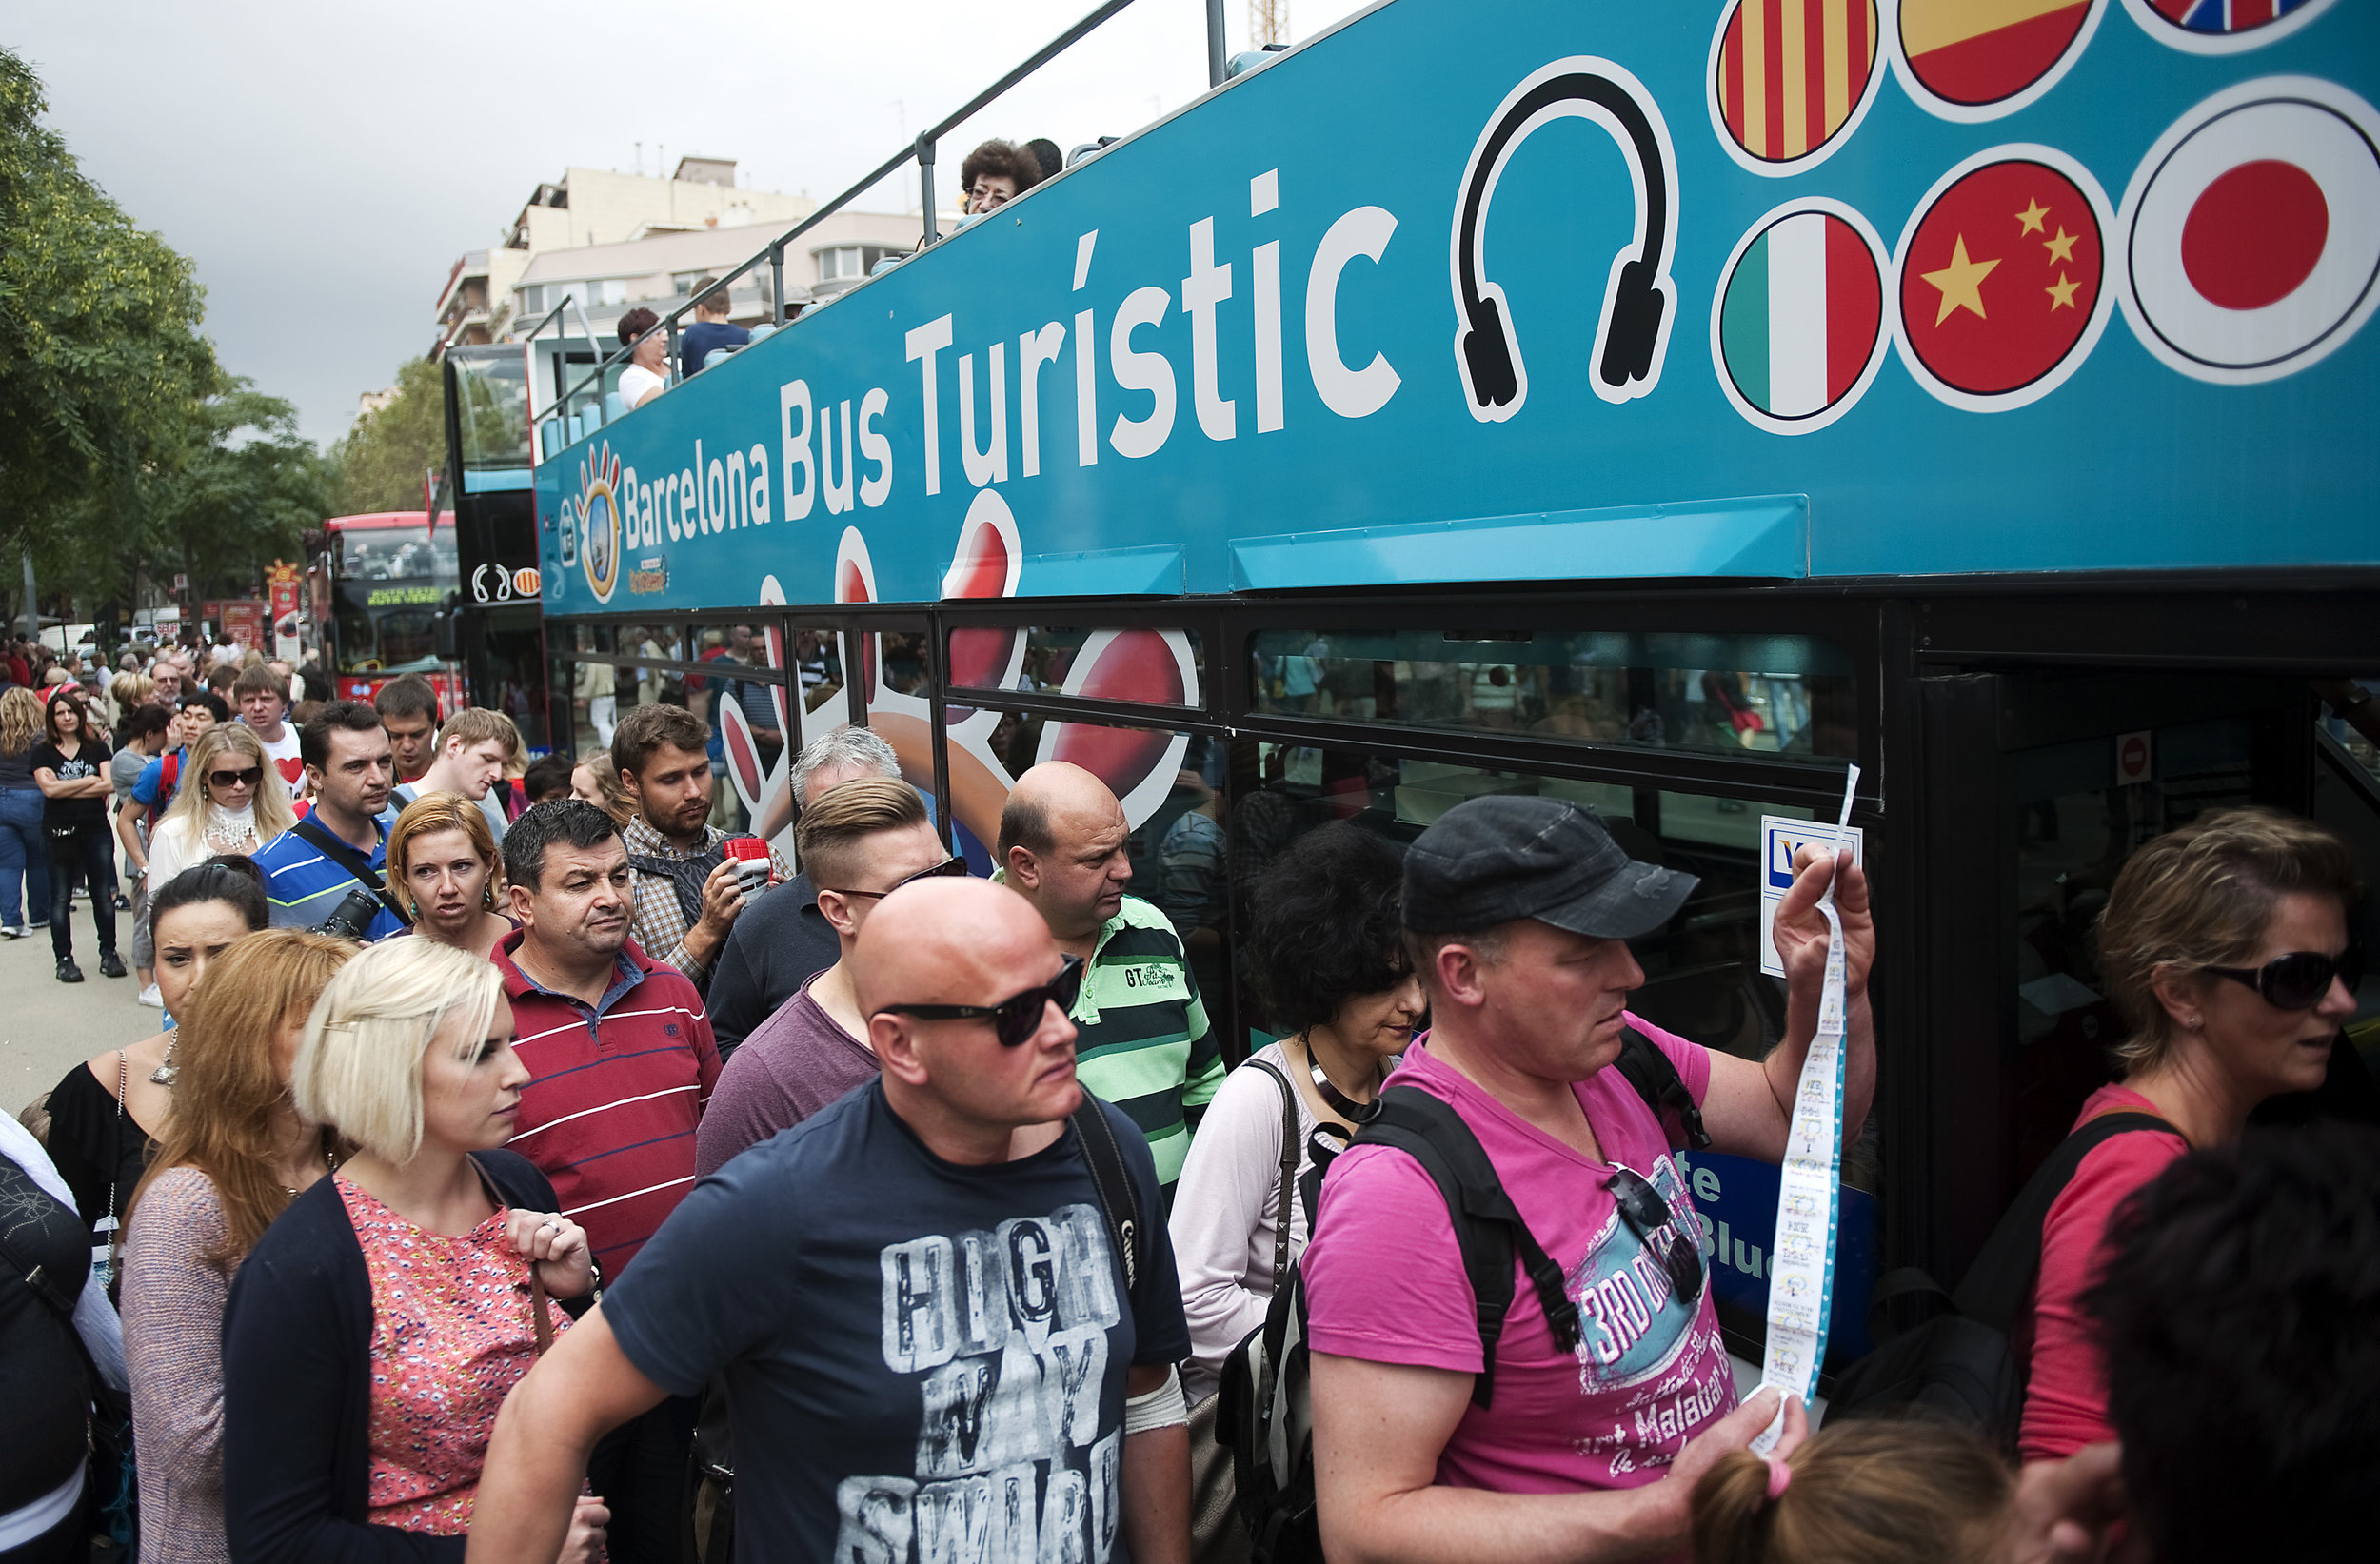 turistes-esperen-turistic-FRANCESC-MELCION_1212488943_6483755_3150x2070.jpg